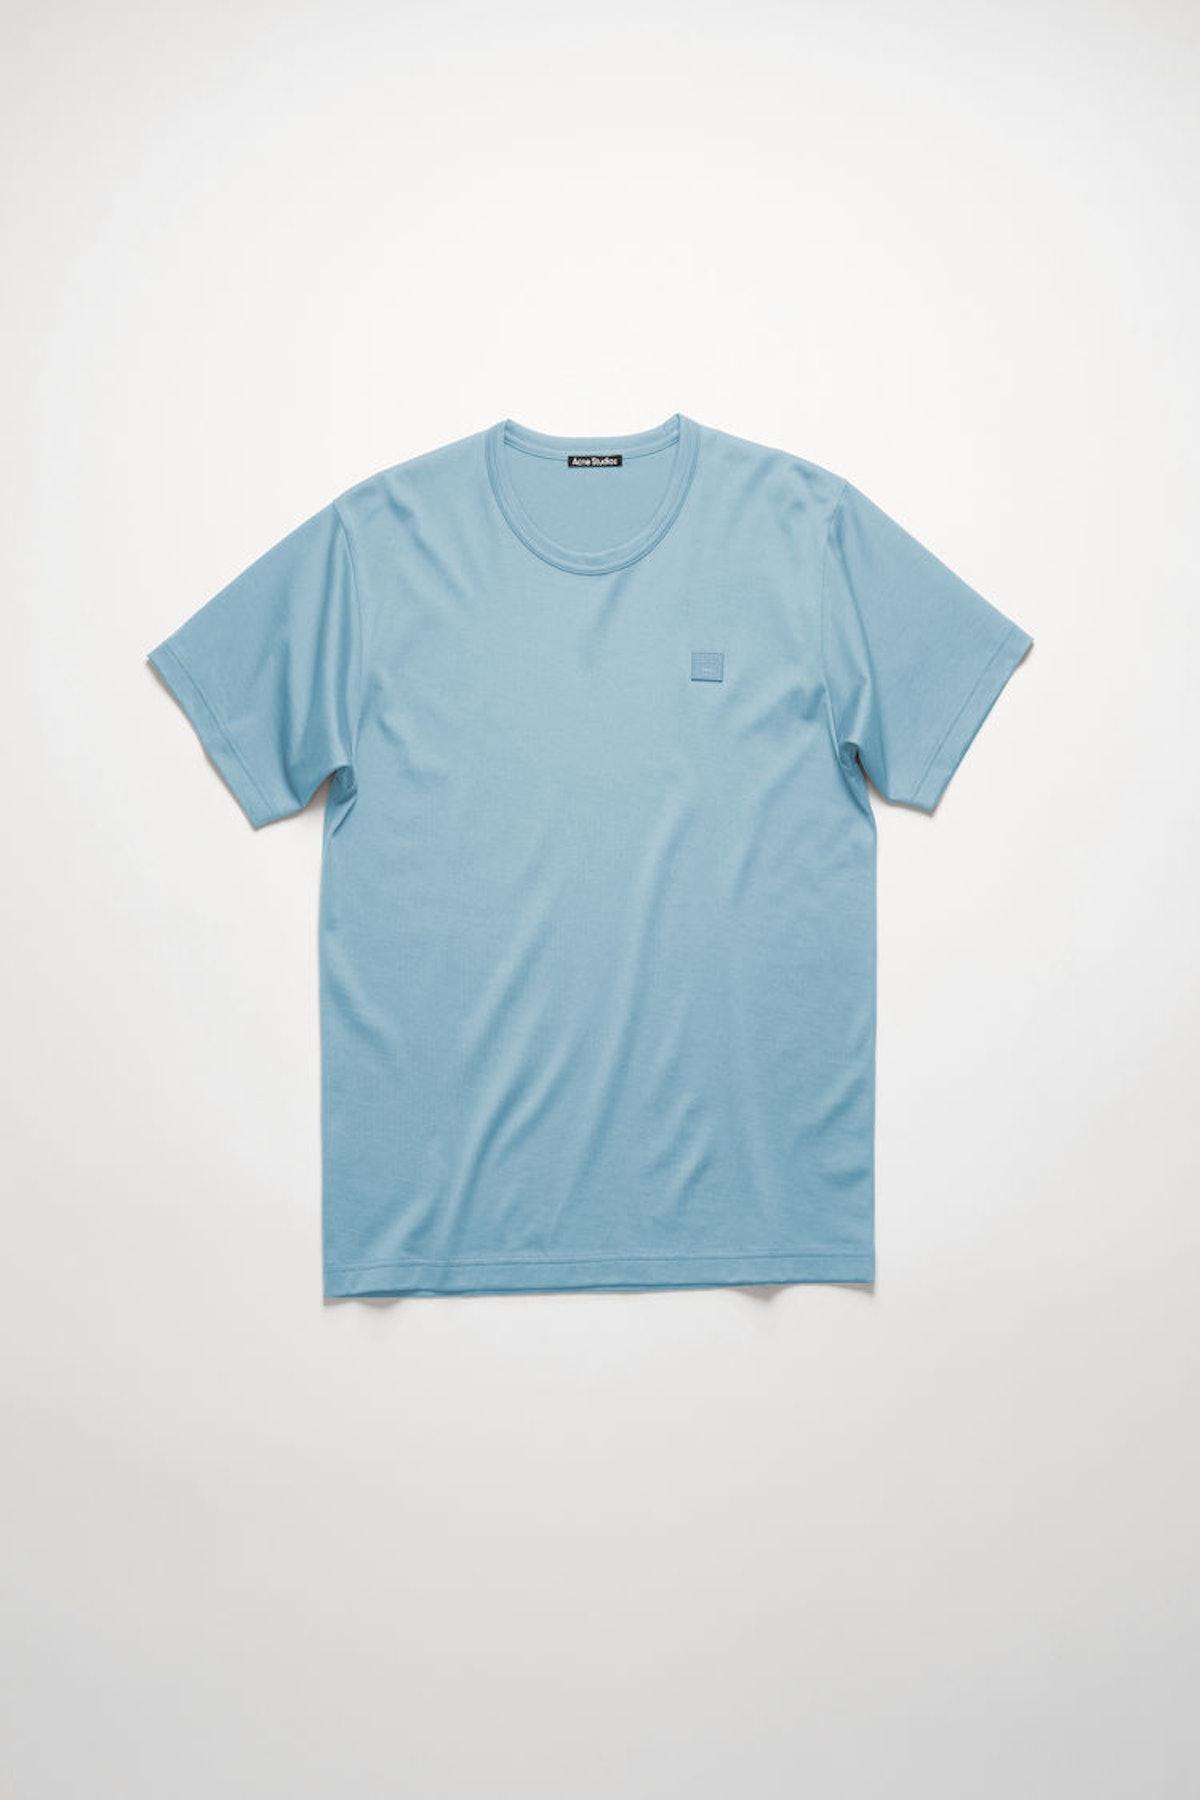 Nash Face t-shirt mineral blue